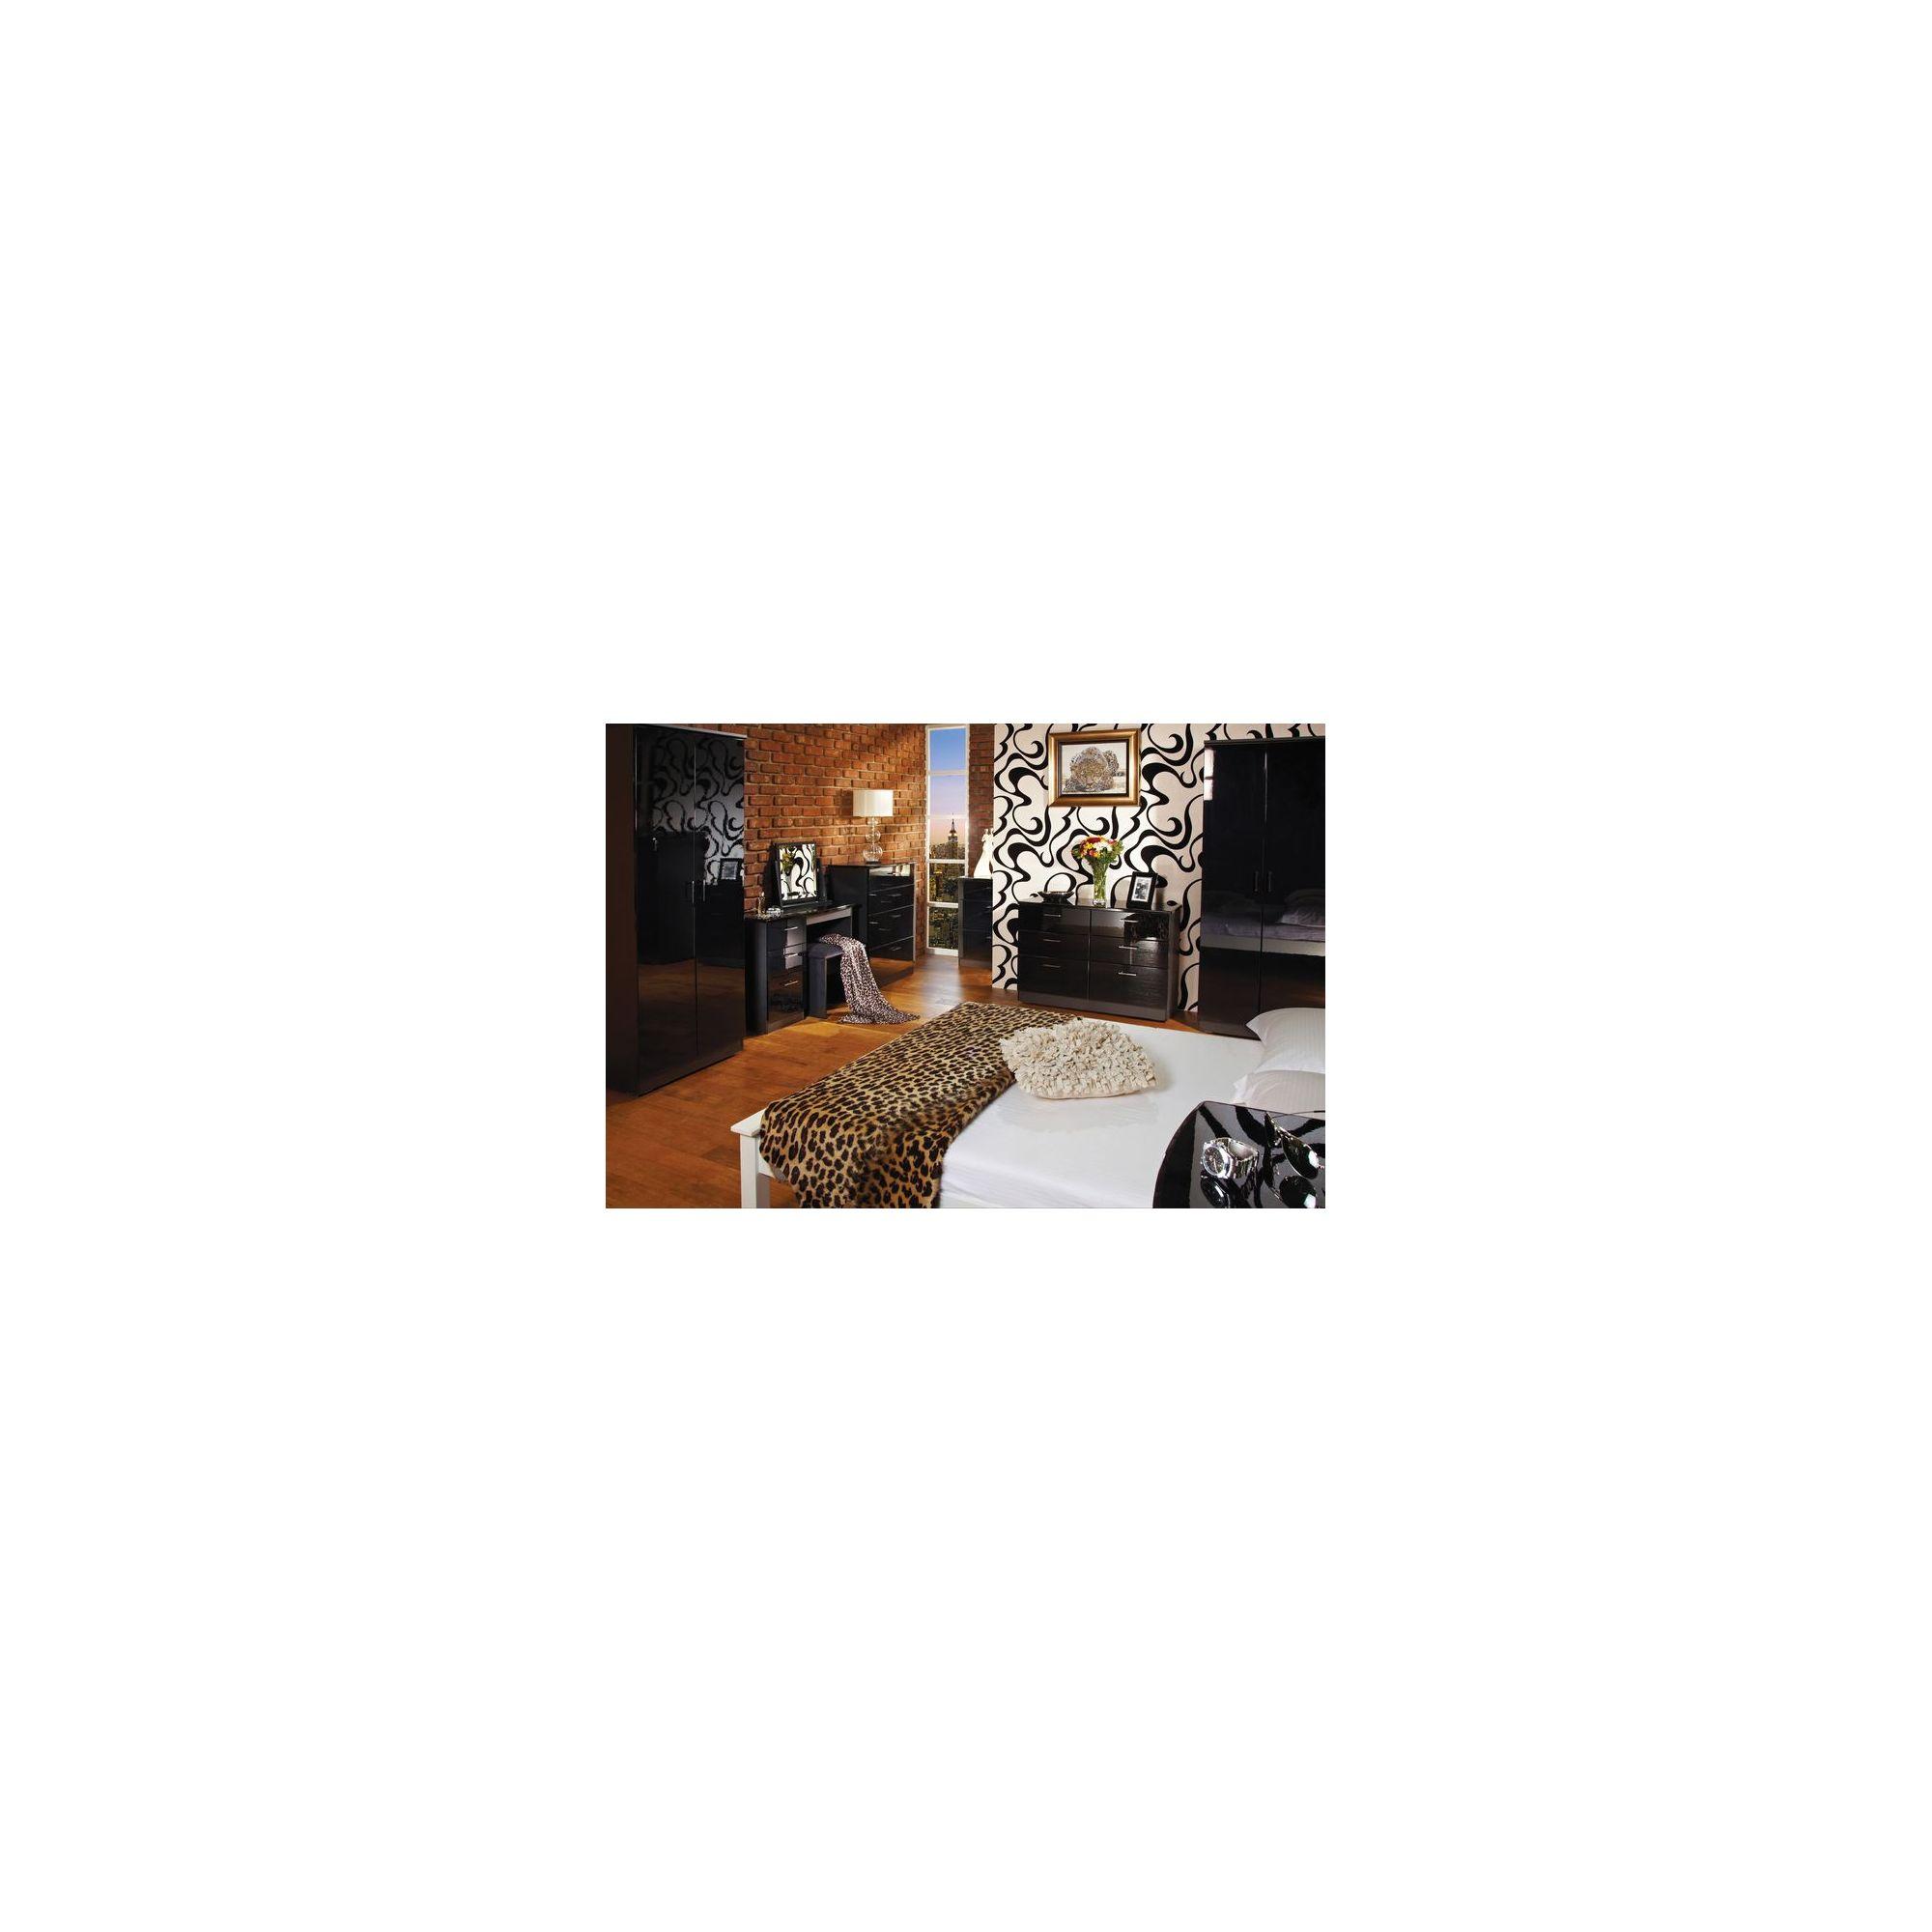 Welcome Furniture Mayfair Tall Plain Wardrobe - Aubergine - Black - Cream at Tesco Direct